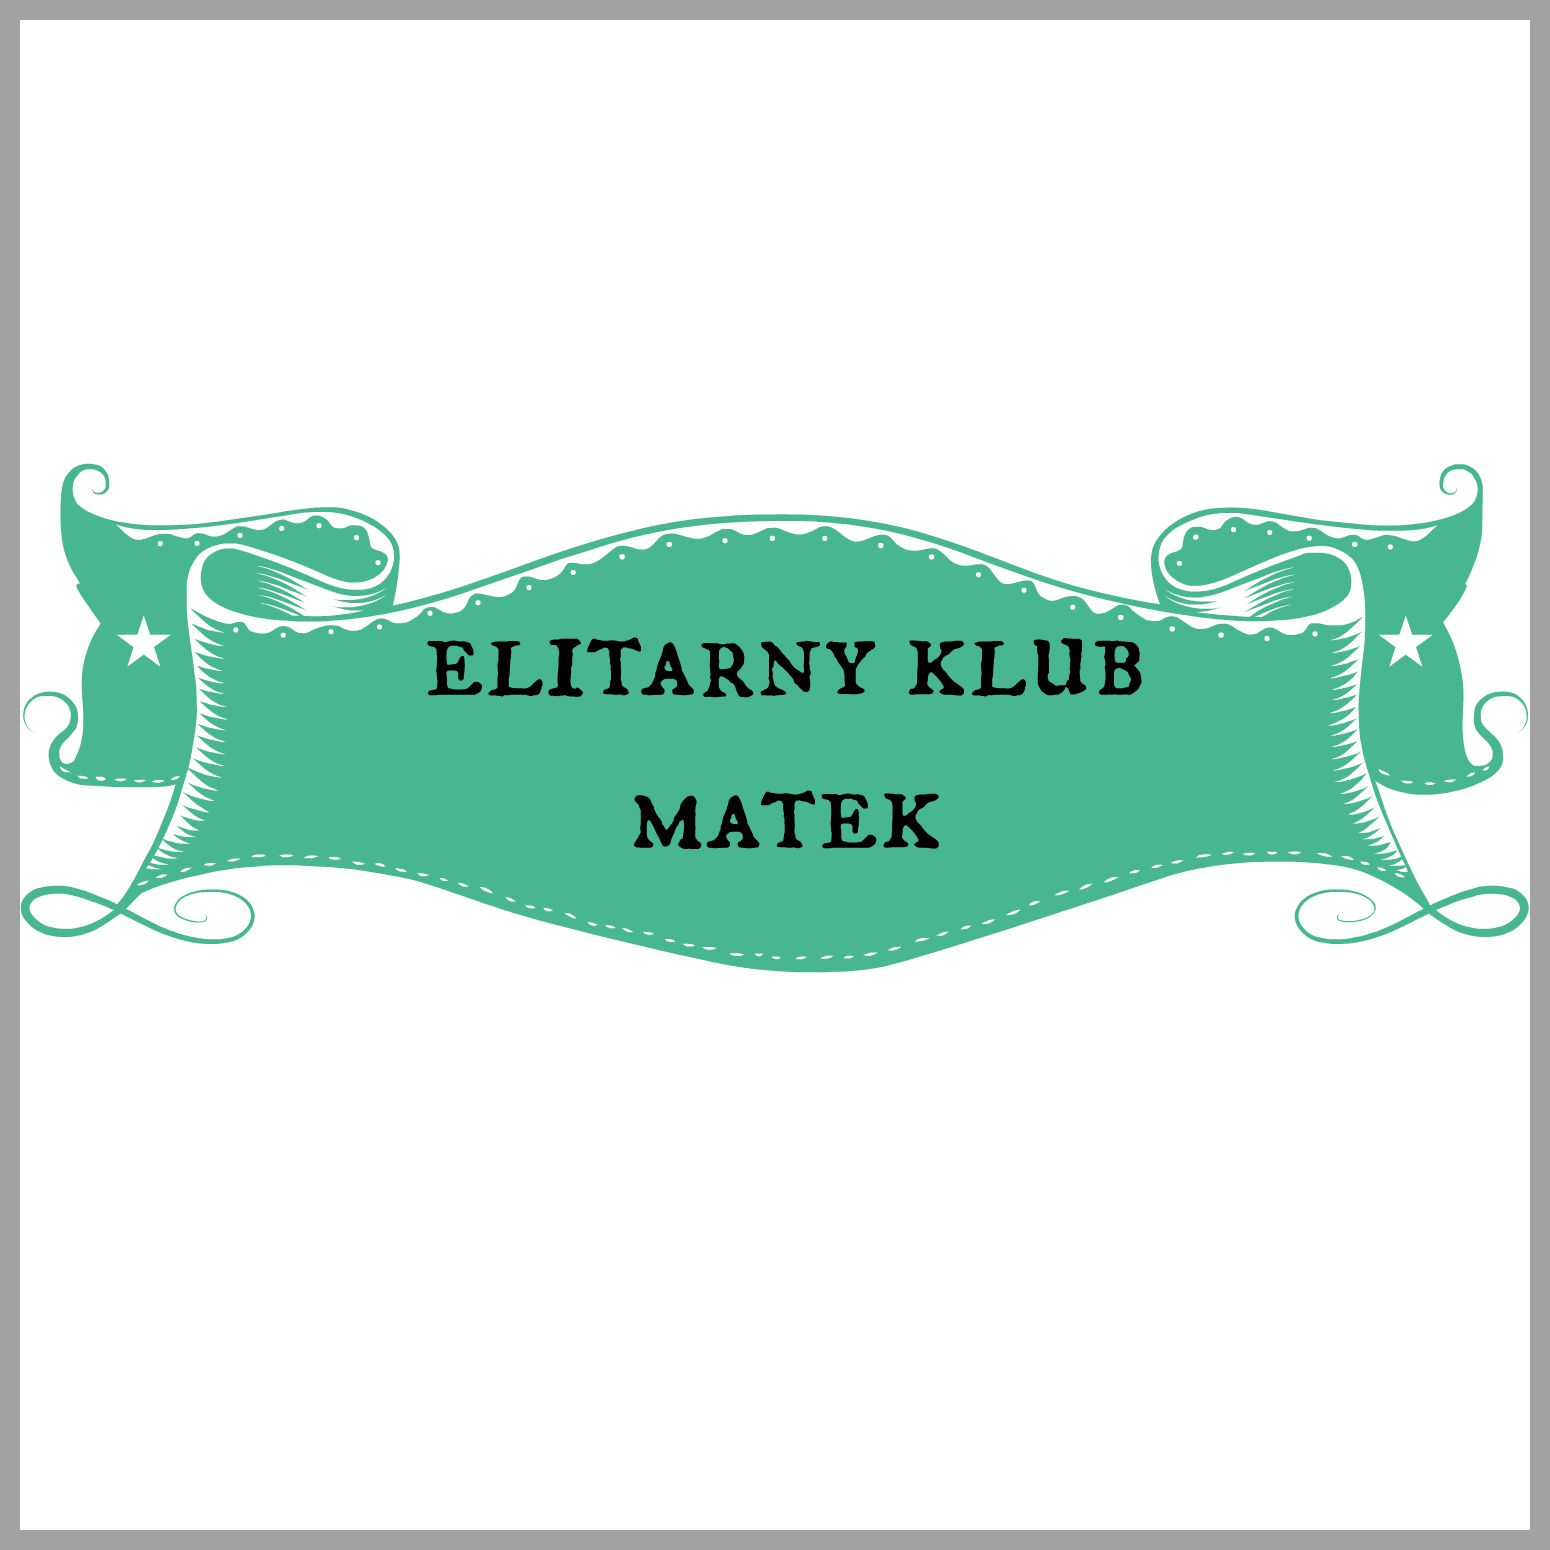 Elitarny klub matek